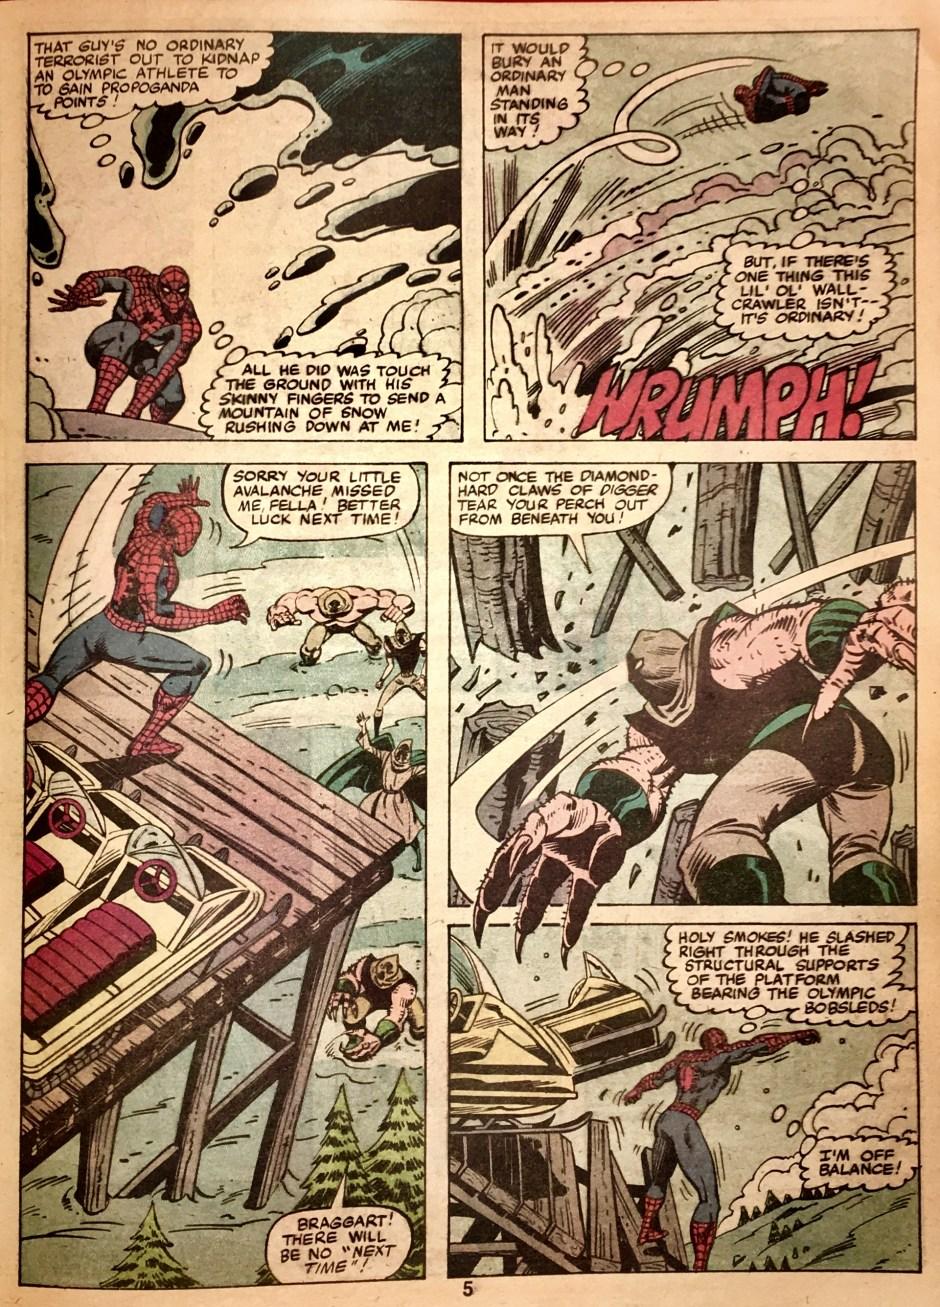 Spiderman vs Hulk at the Winter Olympics_3